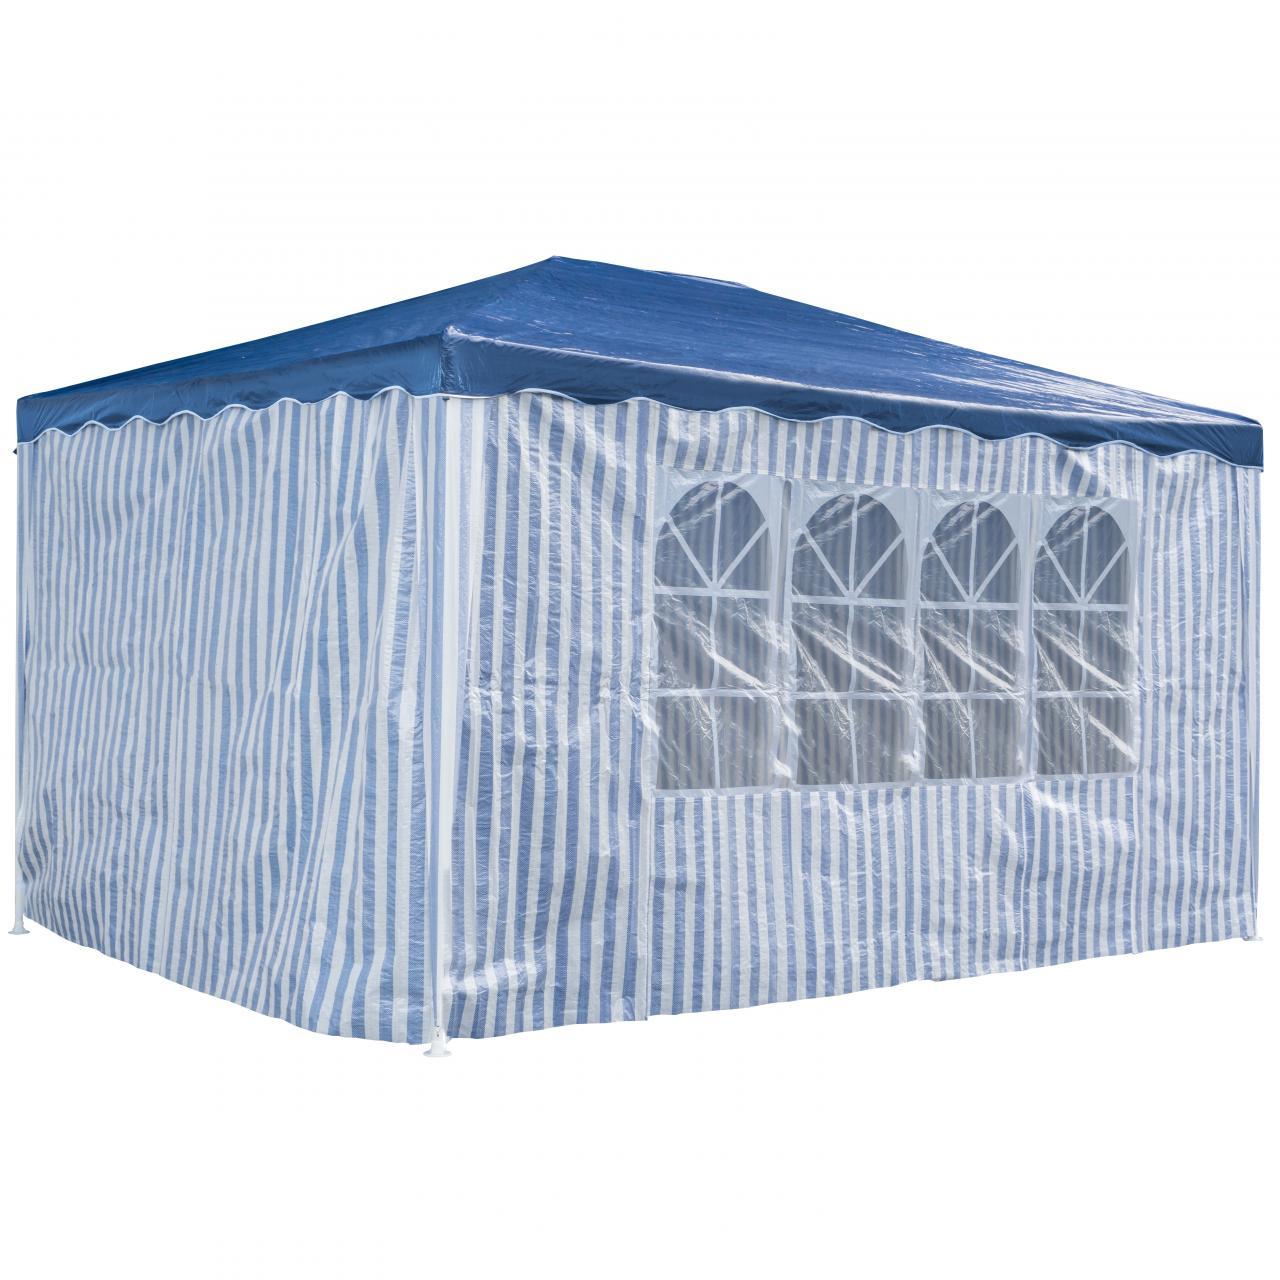 partyzelt festzelt 3x4m gartenpavillon gartenzelt bierzelt pavillon zelt ebay. Black Bedroom Furniture Sets. Home Design Ideas